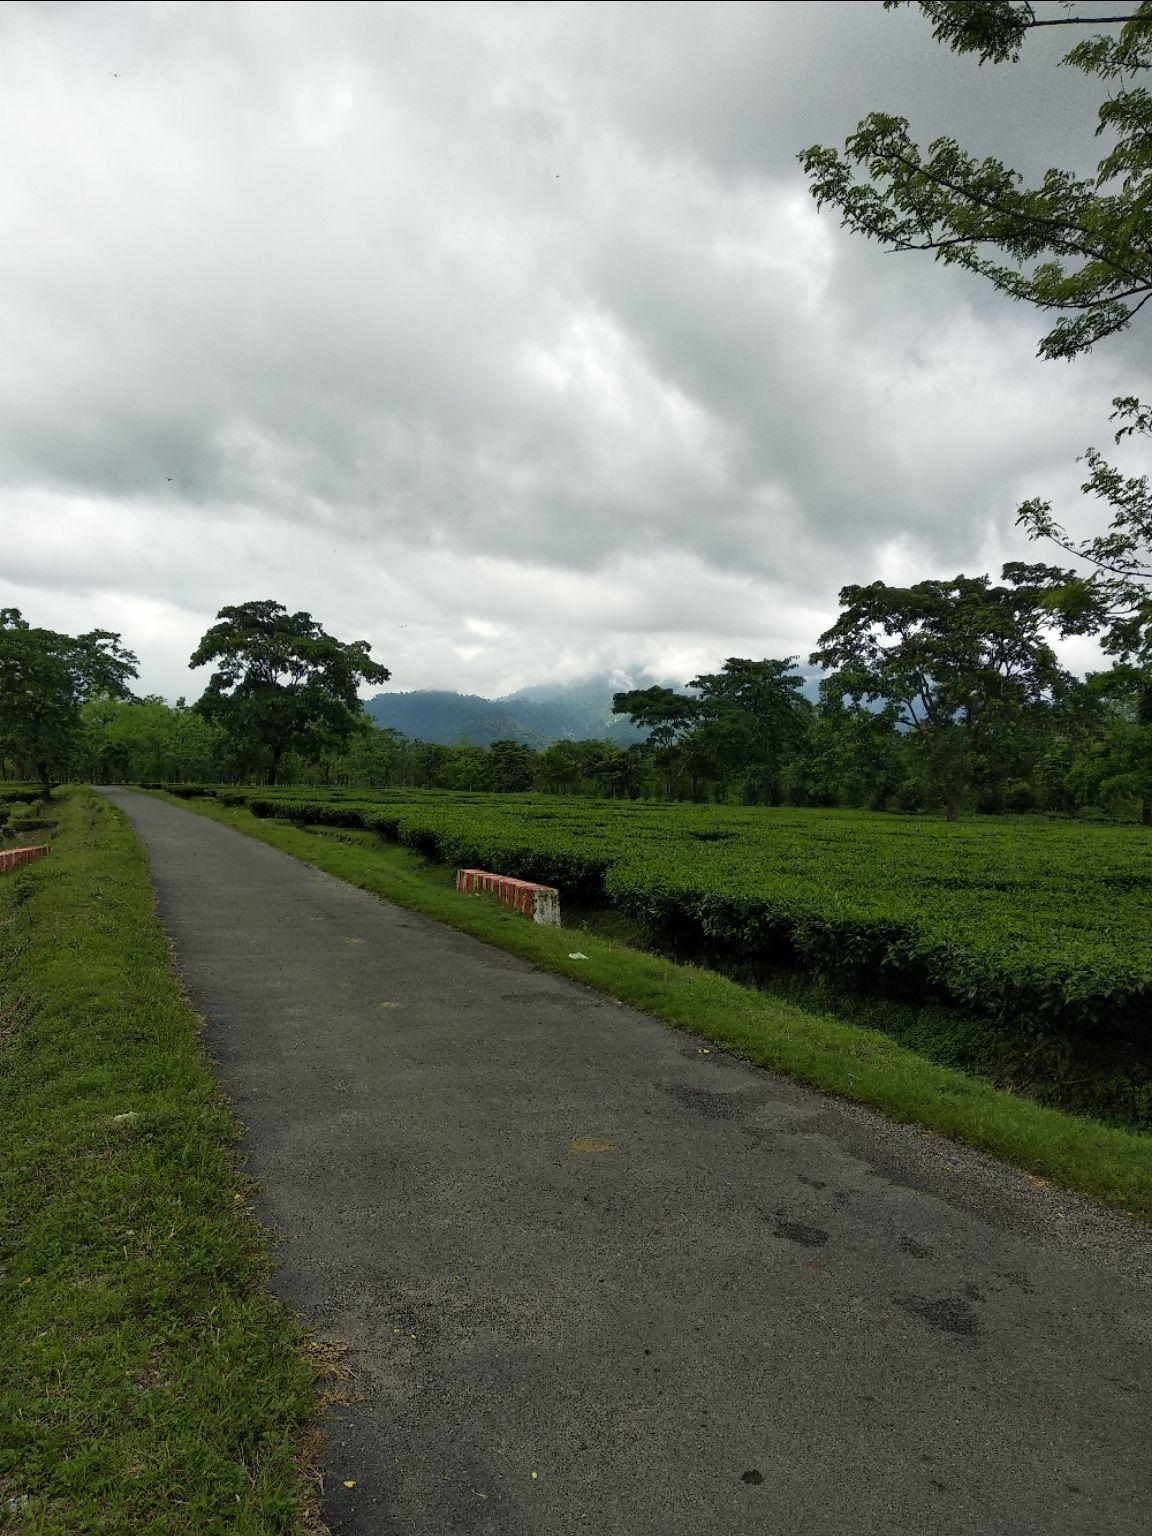 Photo of Raimatang Tea Estate By Yogesh Jain